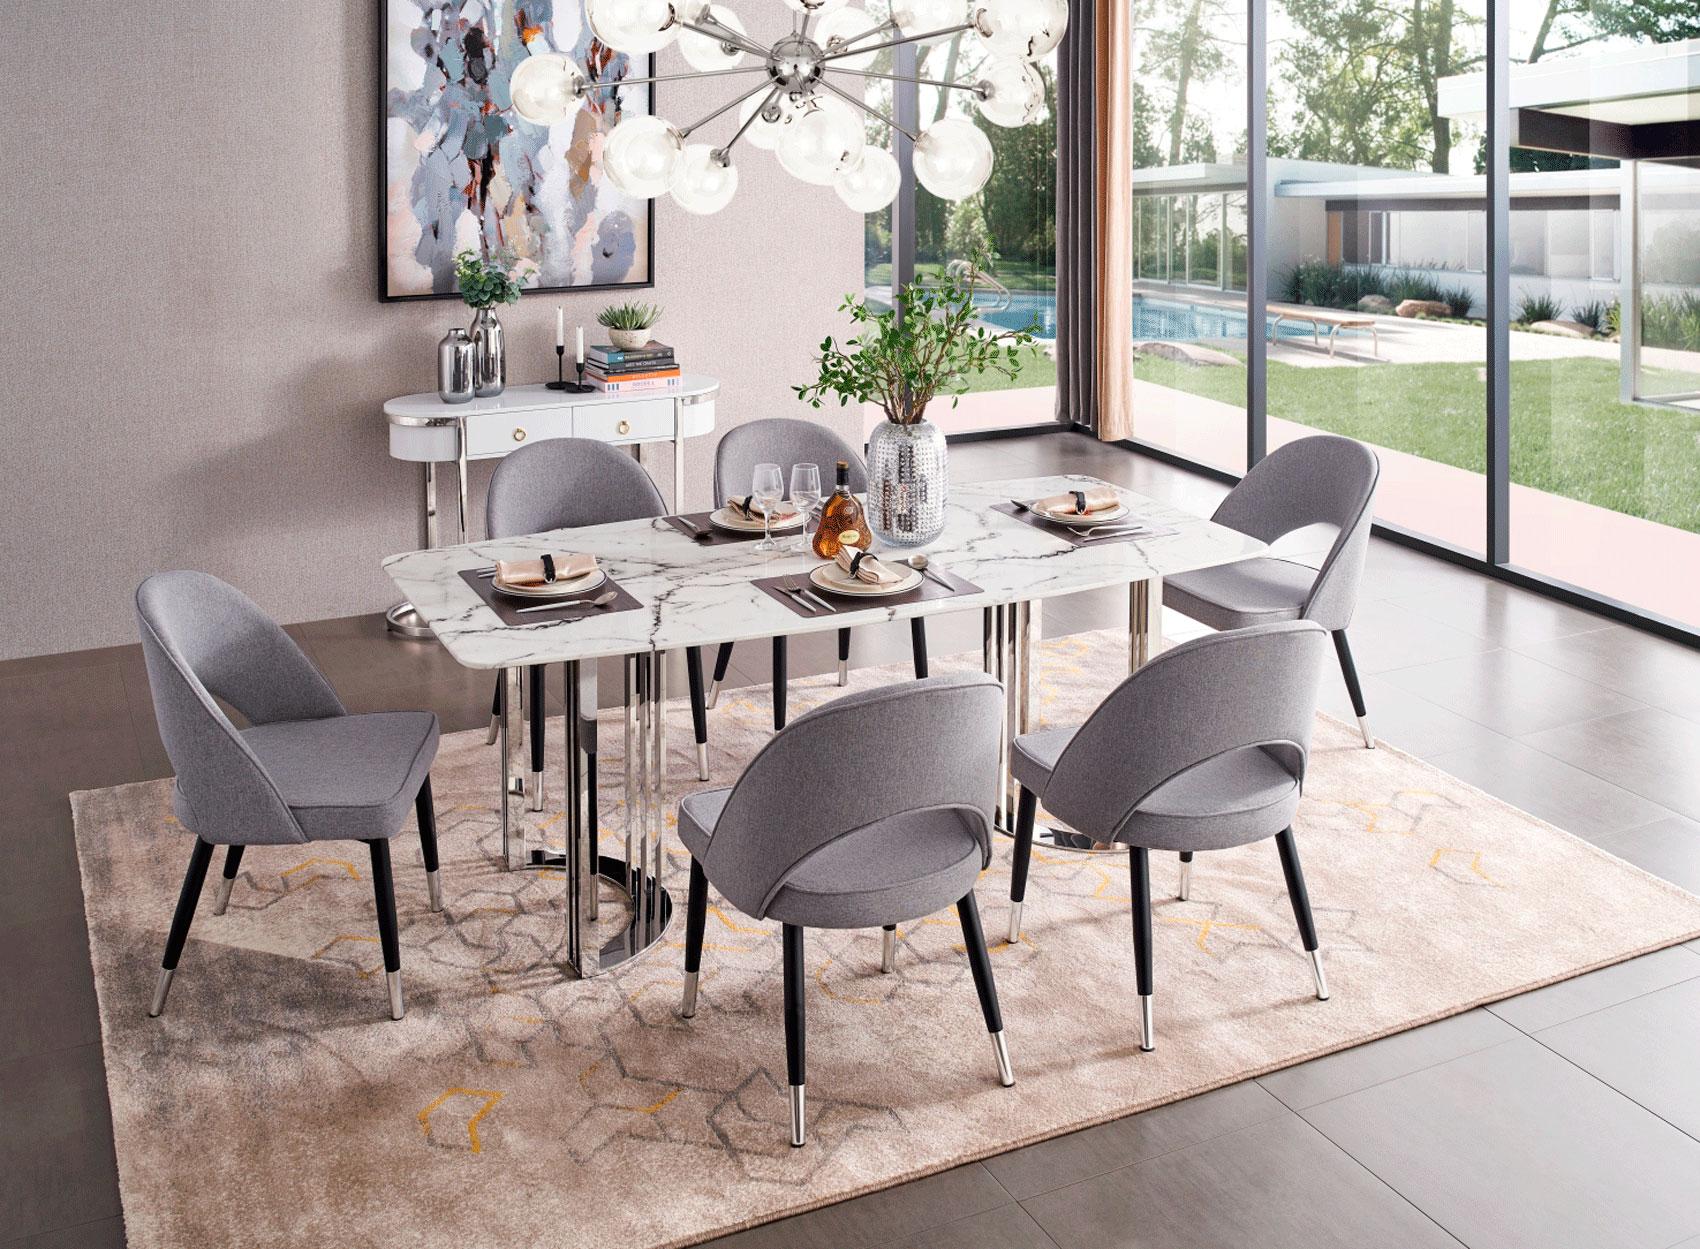 131 Modern Dining Room Set By Esf, Modern Dining Room Set